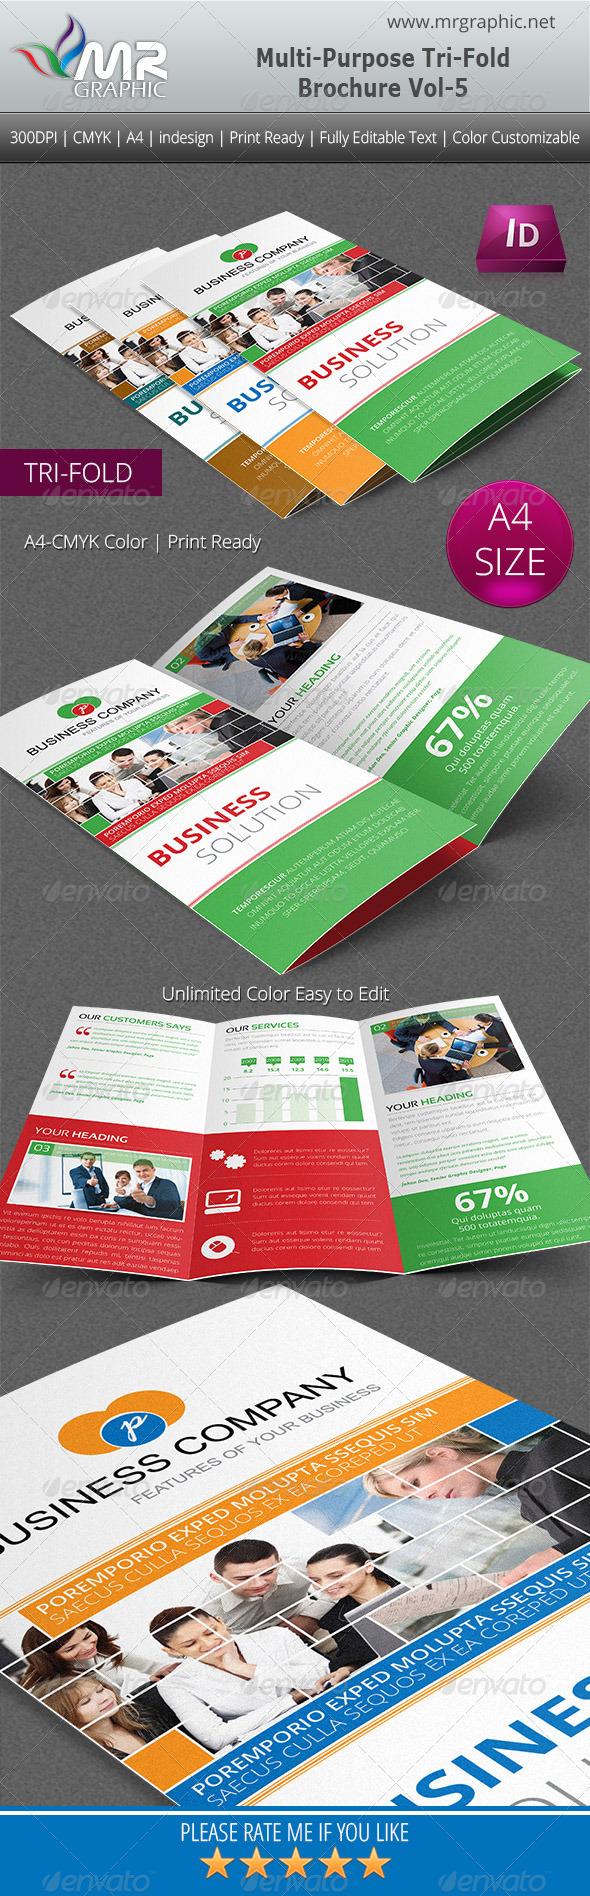 Multipurpose Business Tri-Fold Brochure Vol-5 - Corporate Brochures